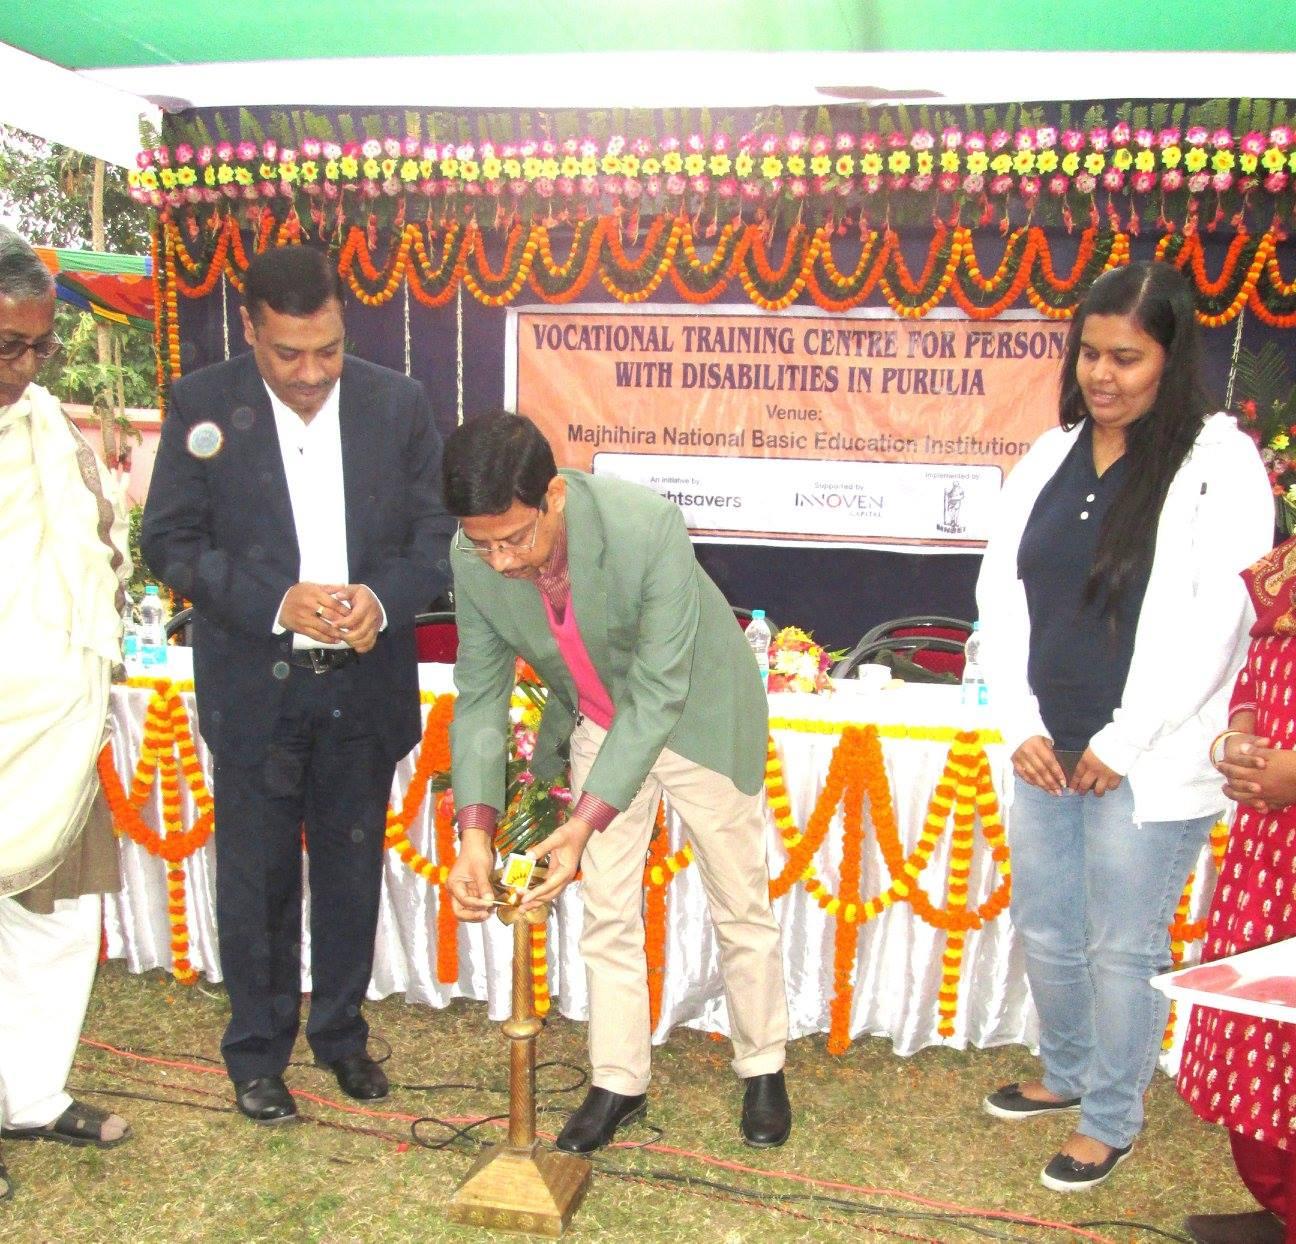 Inauguration Photos 1